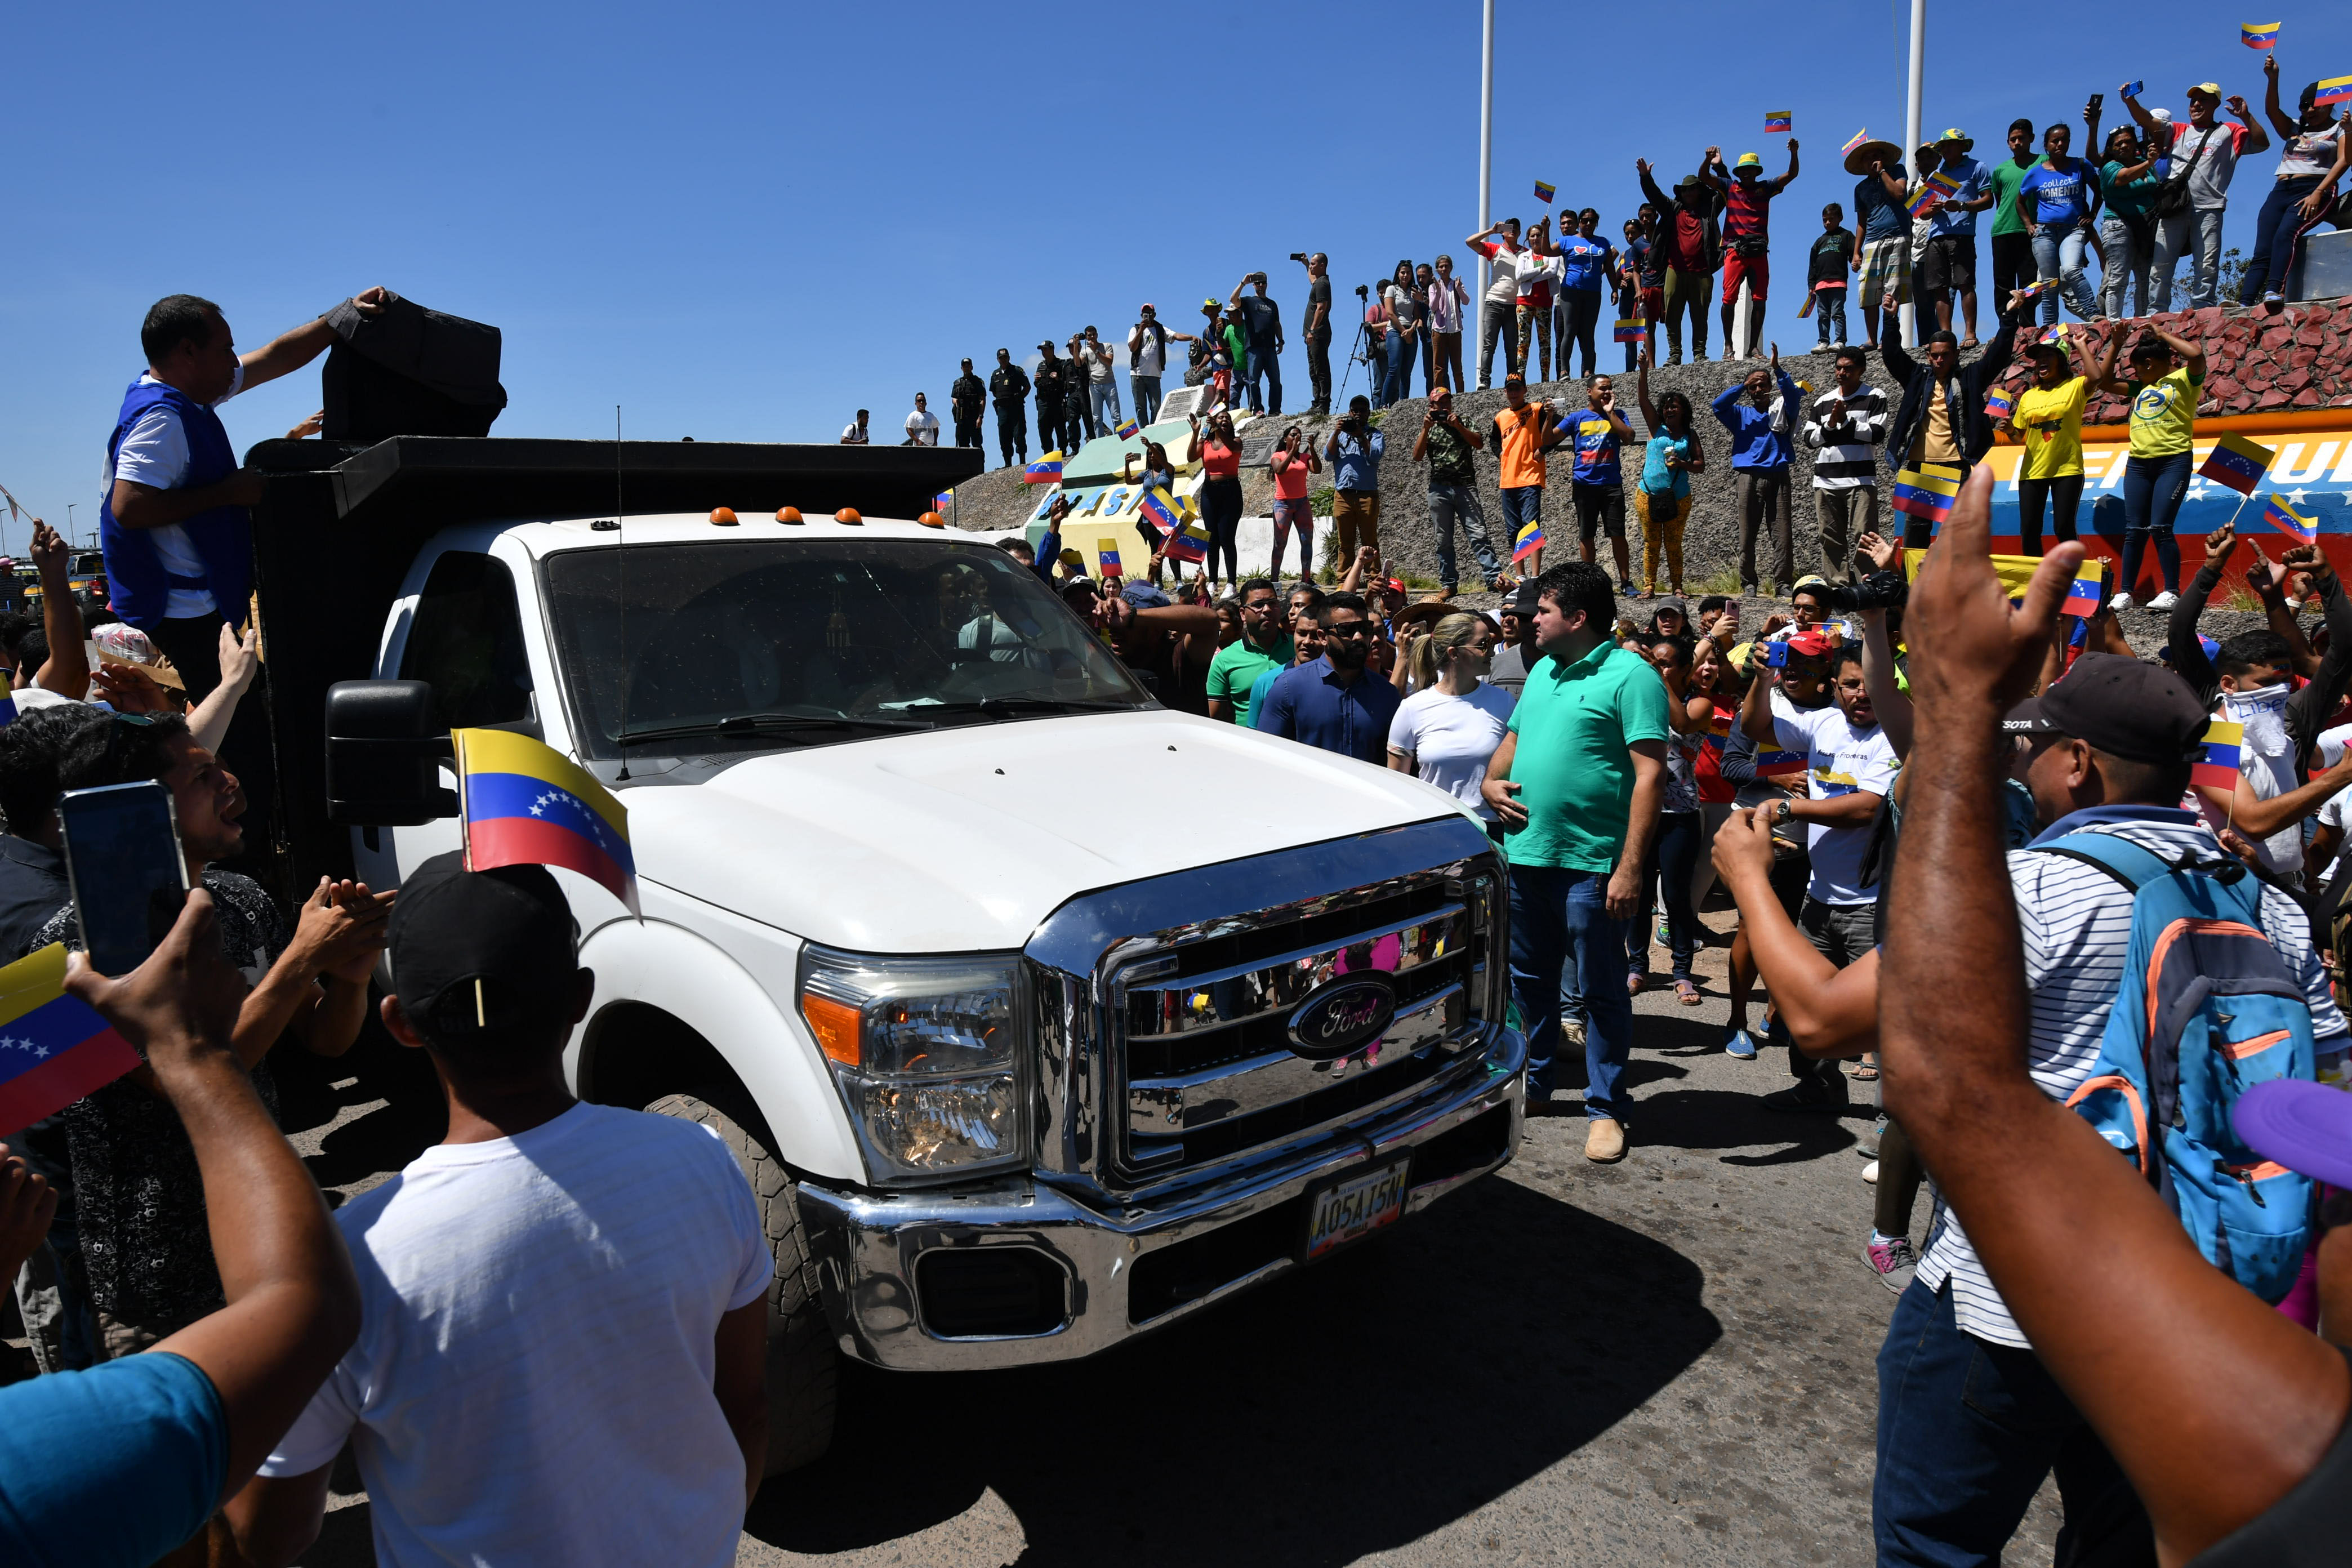 人們在歡呼,首批救援物資進入委內瑞拉。(NELSON ALMEIDA/AFP/Getty Images)